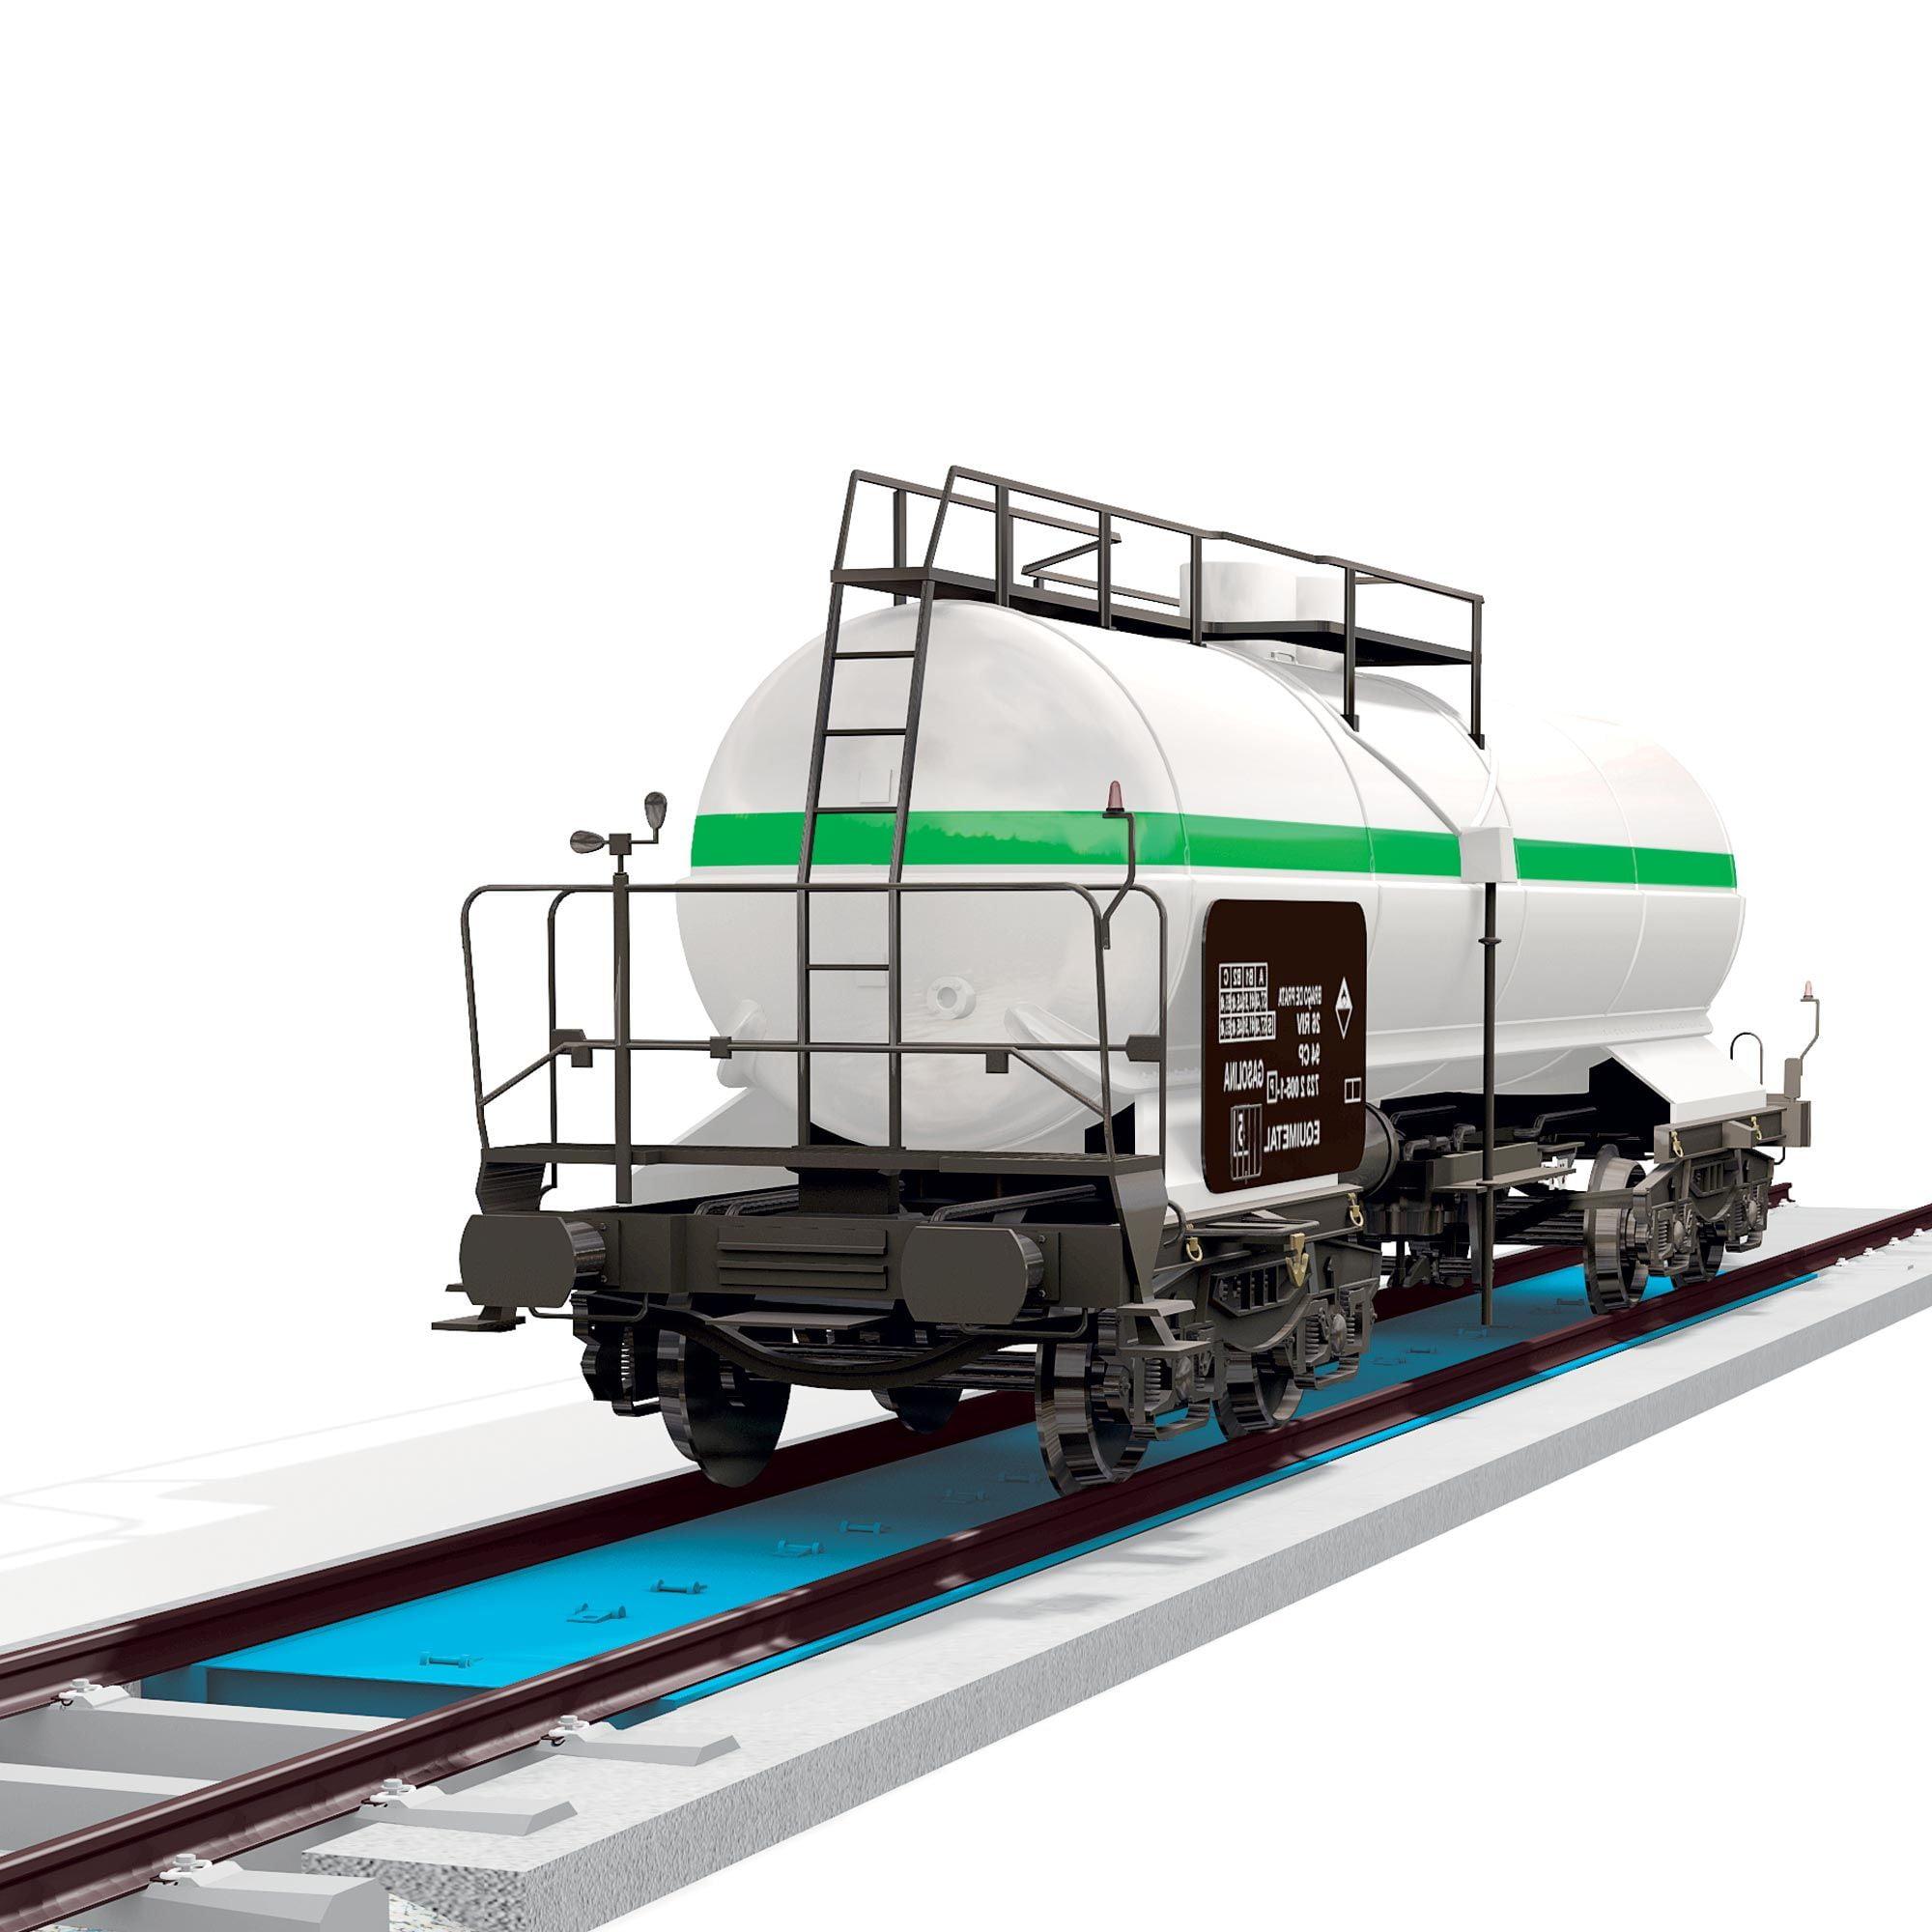 RAILBRIDGE_Vagon_Kantari_Railway_Scales